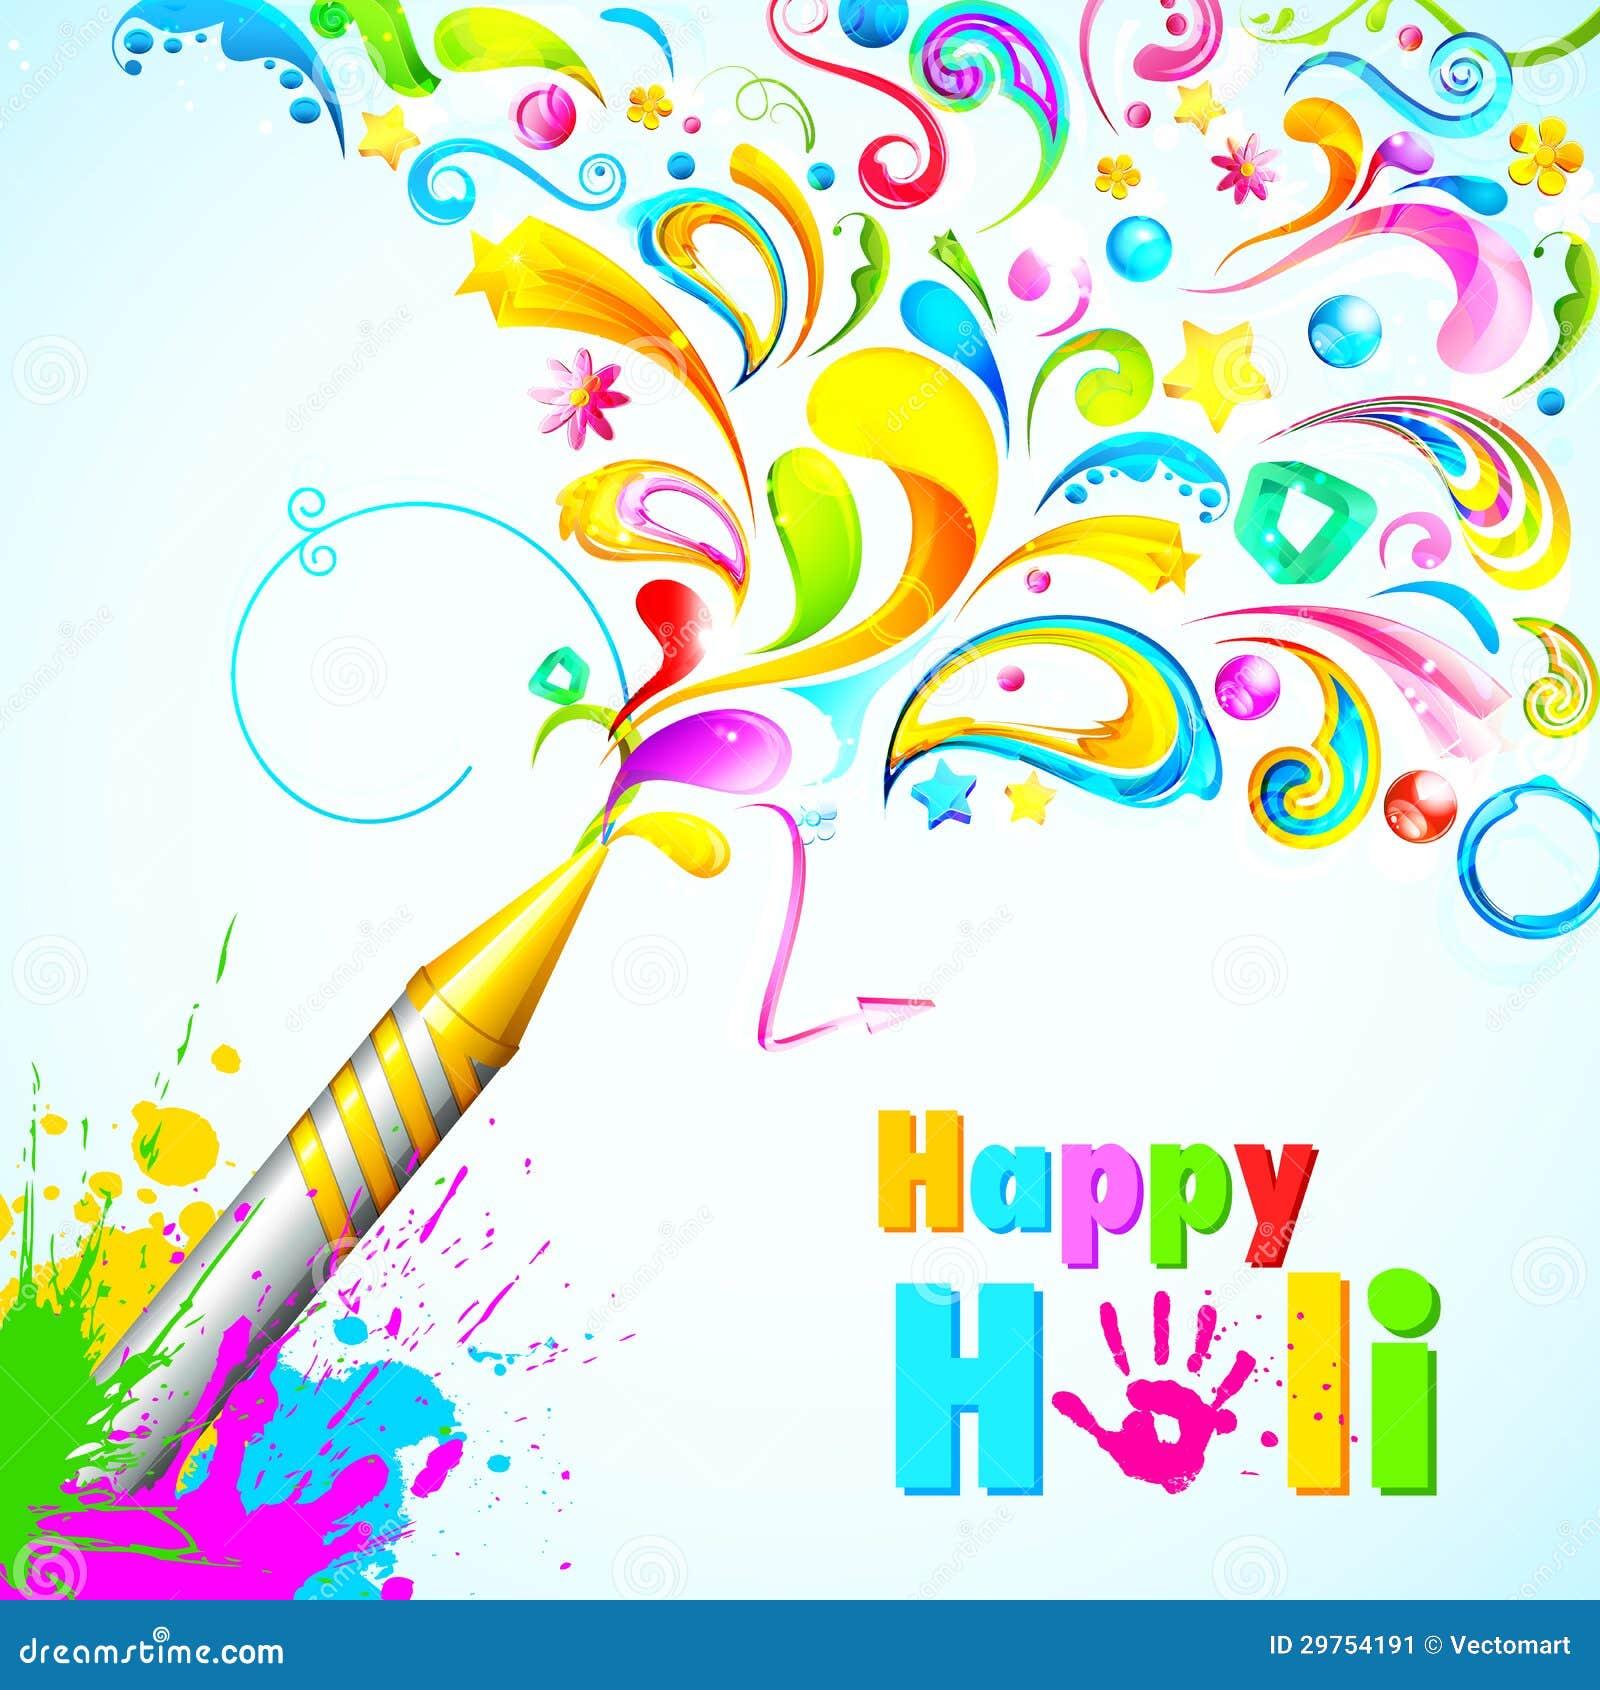 Illustration of colorful floral swirl around Holi pichkari.